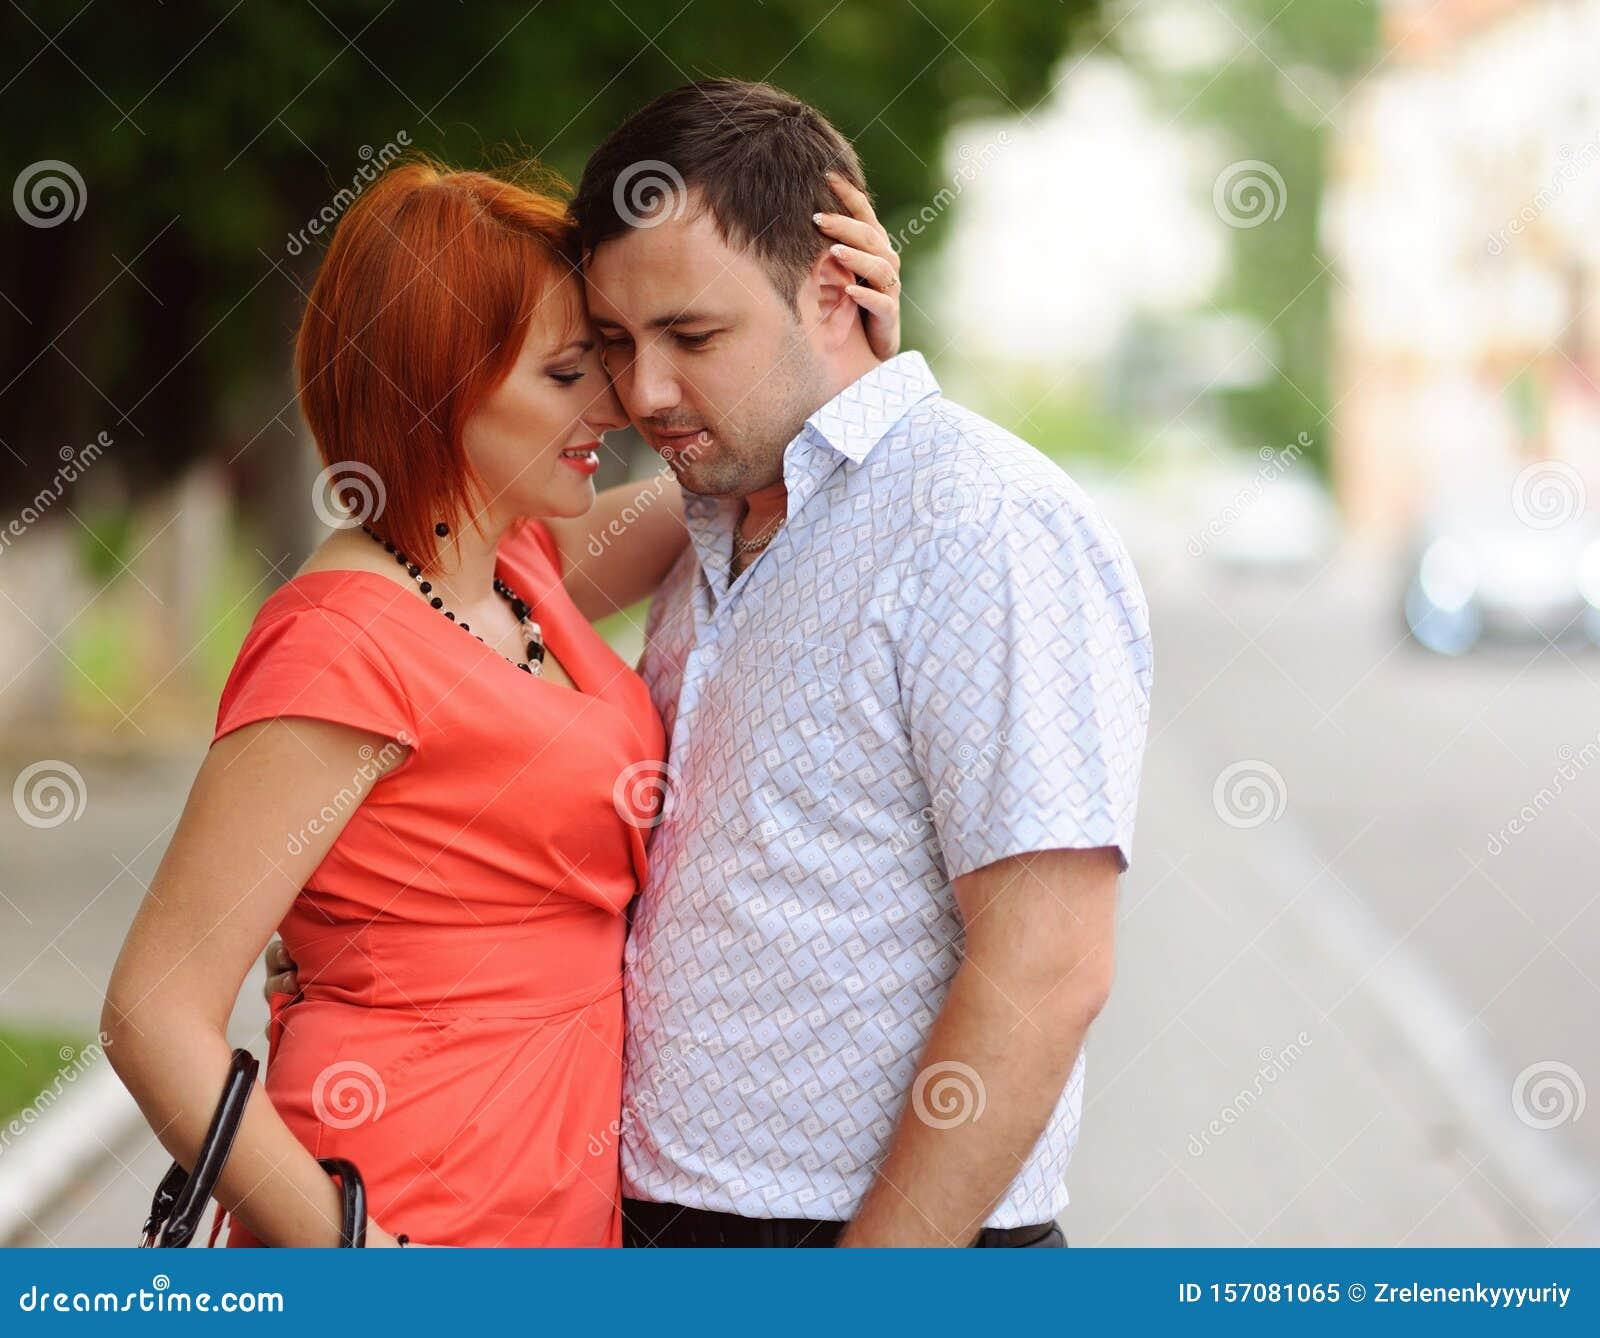 casual dating joy